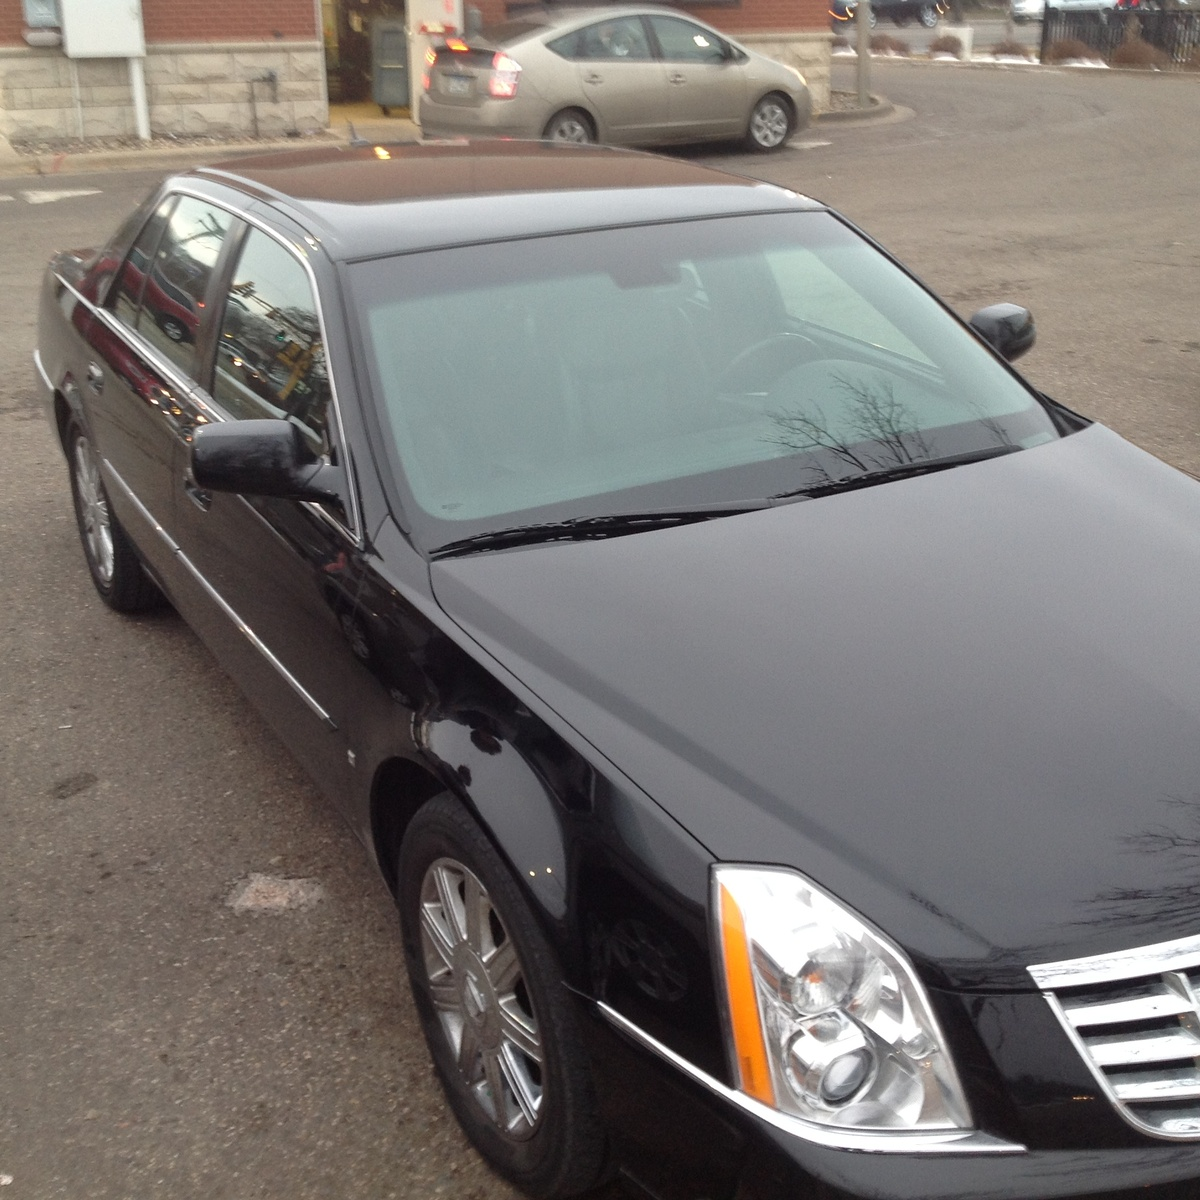 Cadillac 2006 cadillac deville : Cadillac DTS Questions - My car is a 2006 Cadillac DTS, BATTERY ...